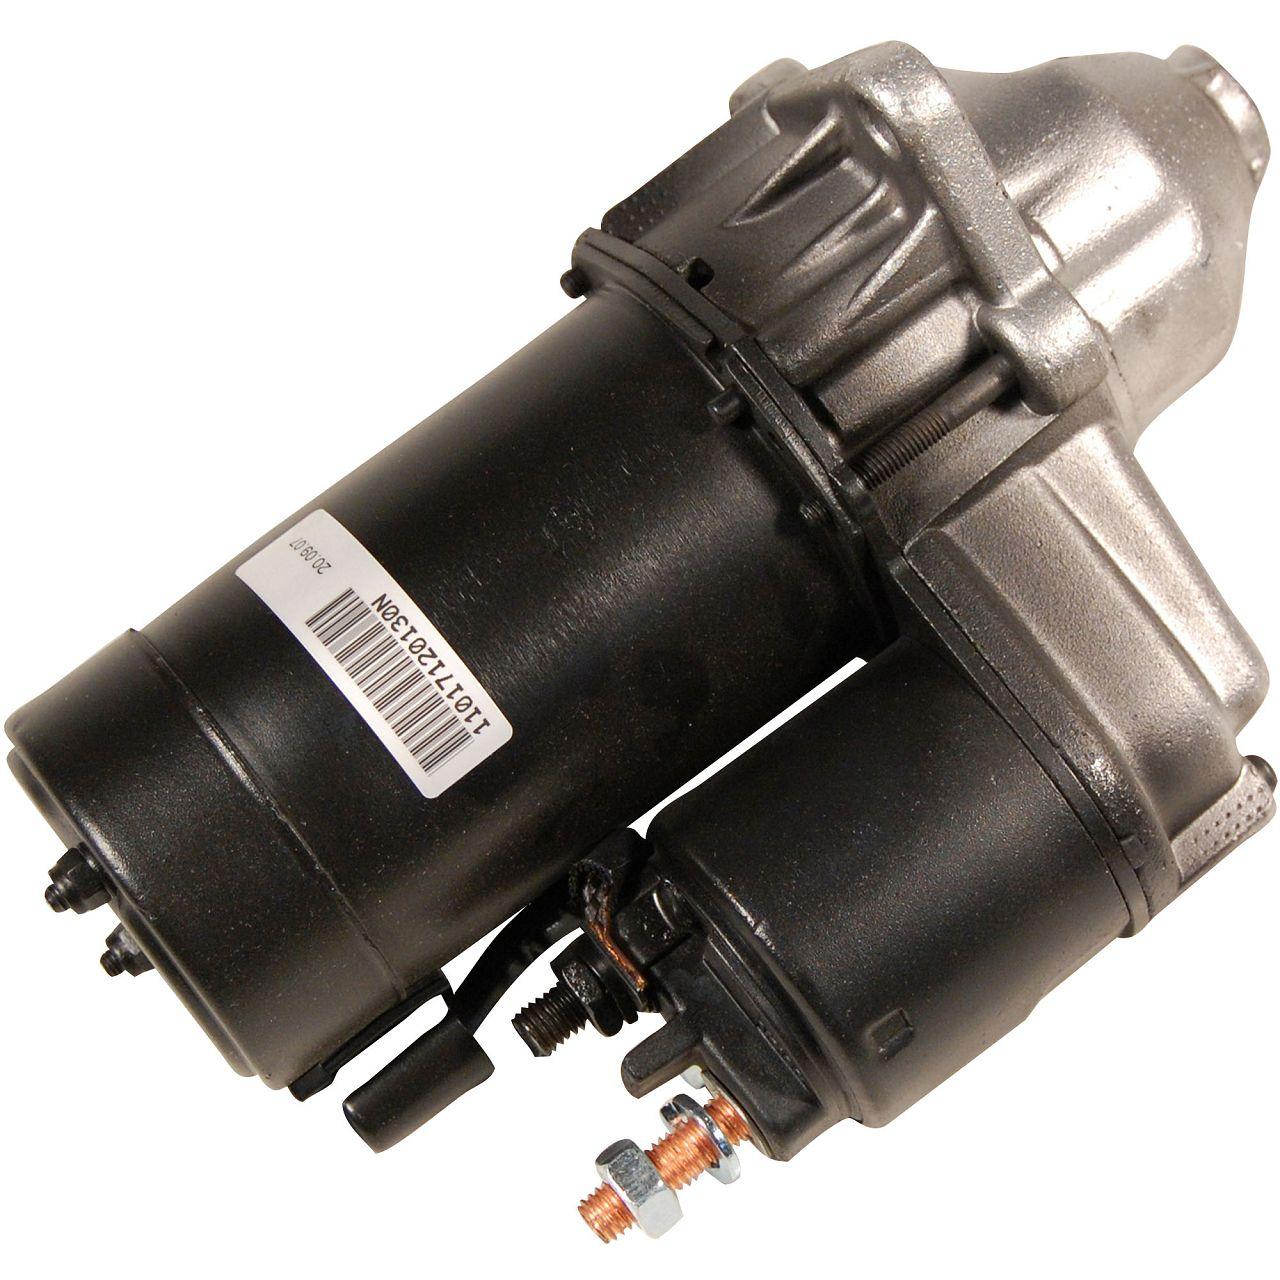 Anlasser Starter 12V 0,9KW für OPEL ASTRA CORSA VECTRA ZAFIRA COMBO uvm. 1202173